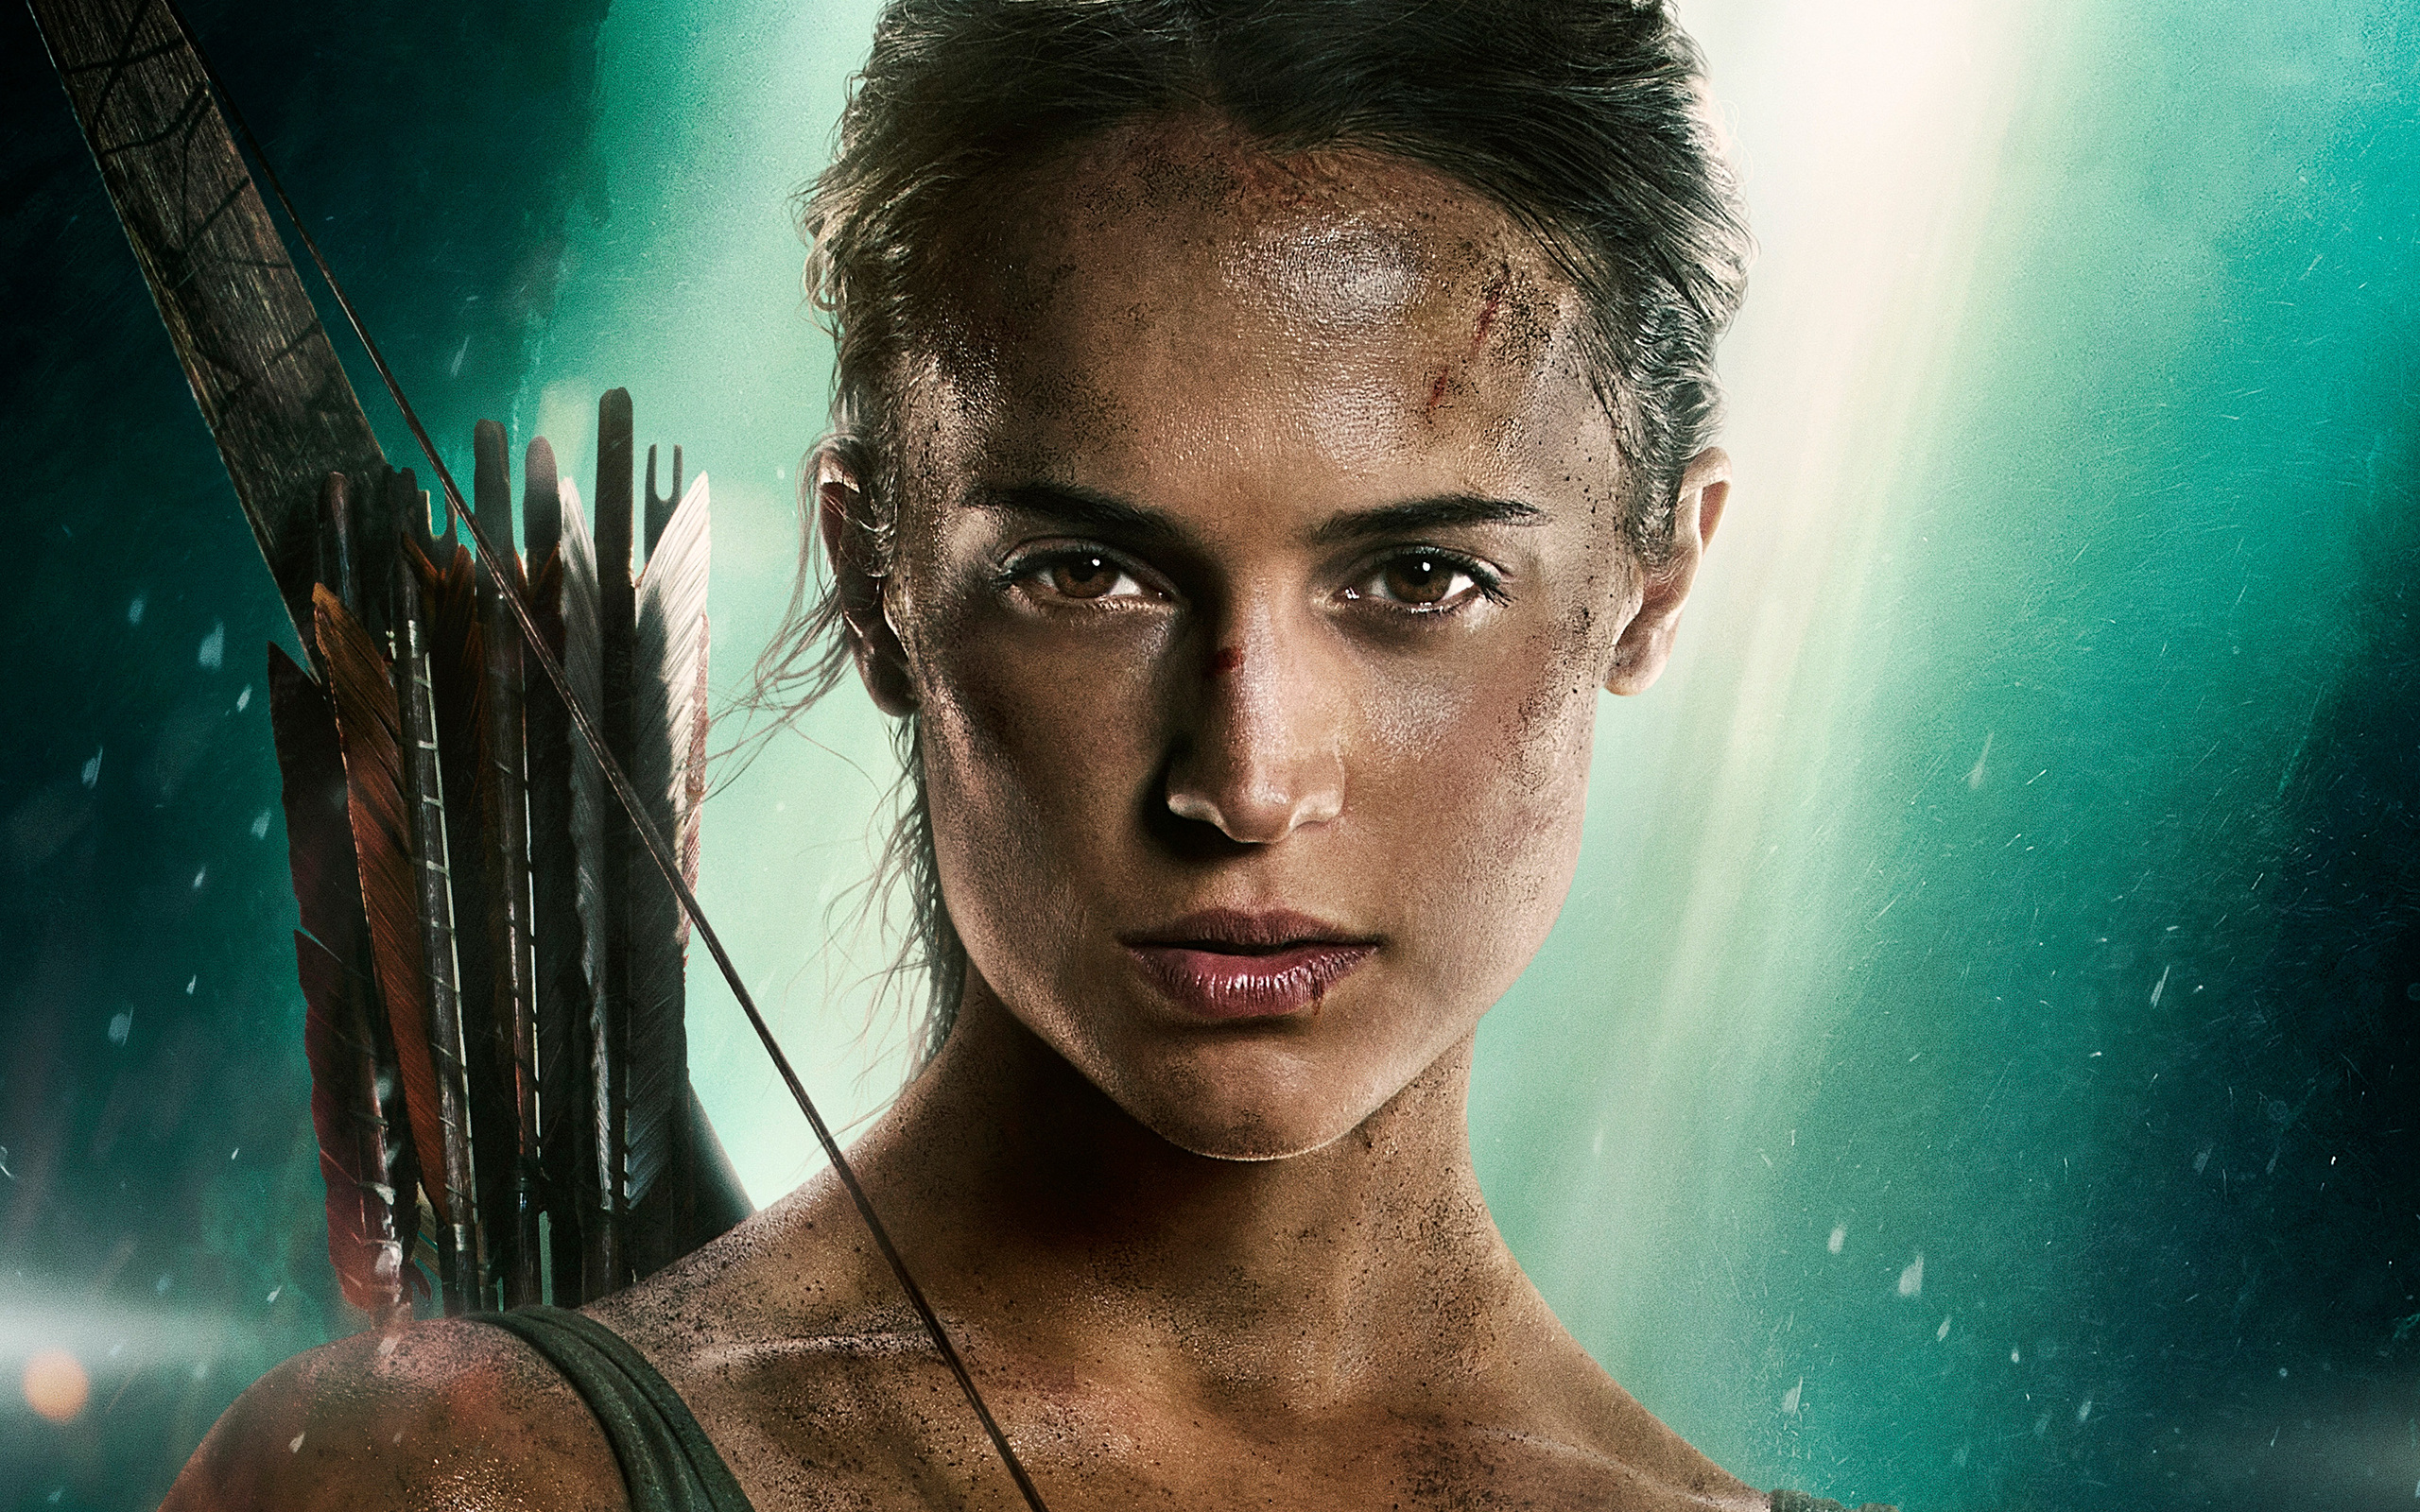 alicia-vikander-as-lara-croft-in-tomb-raider-2018-movie-4k-wq.jpg